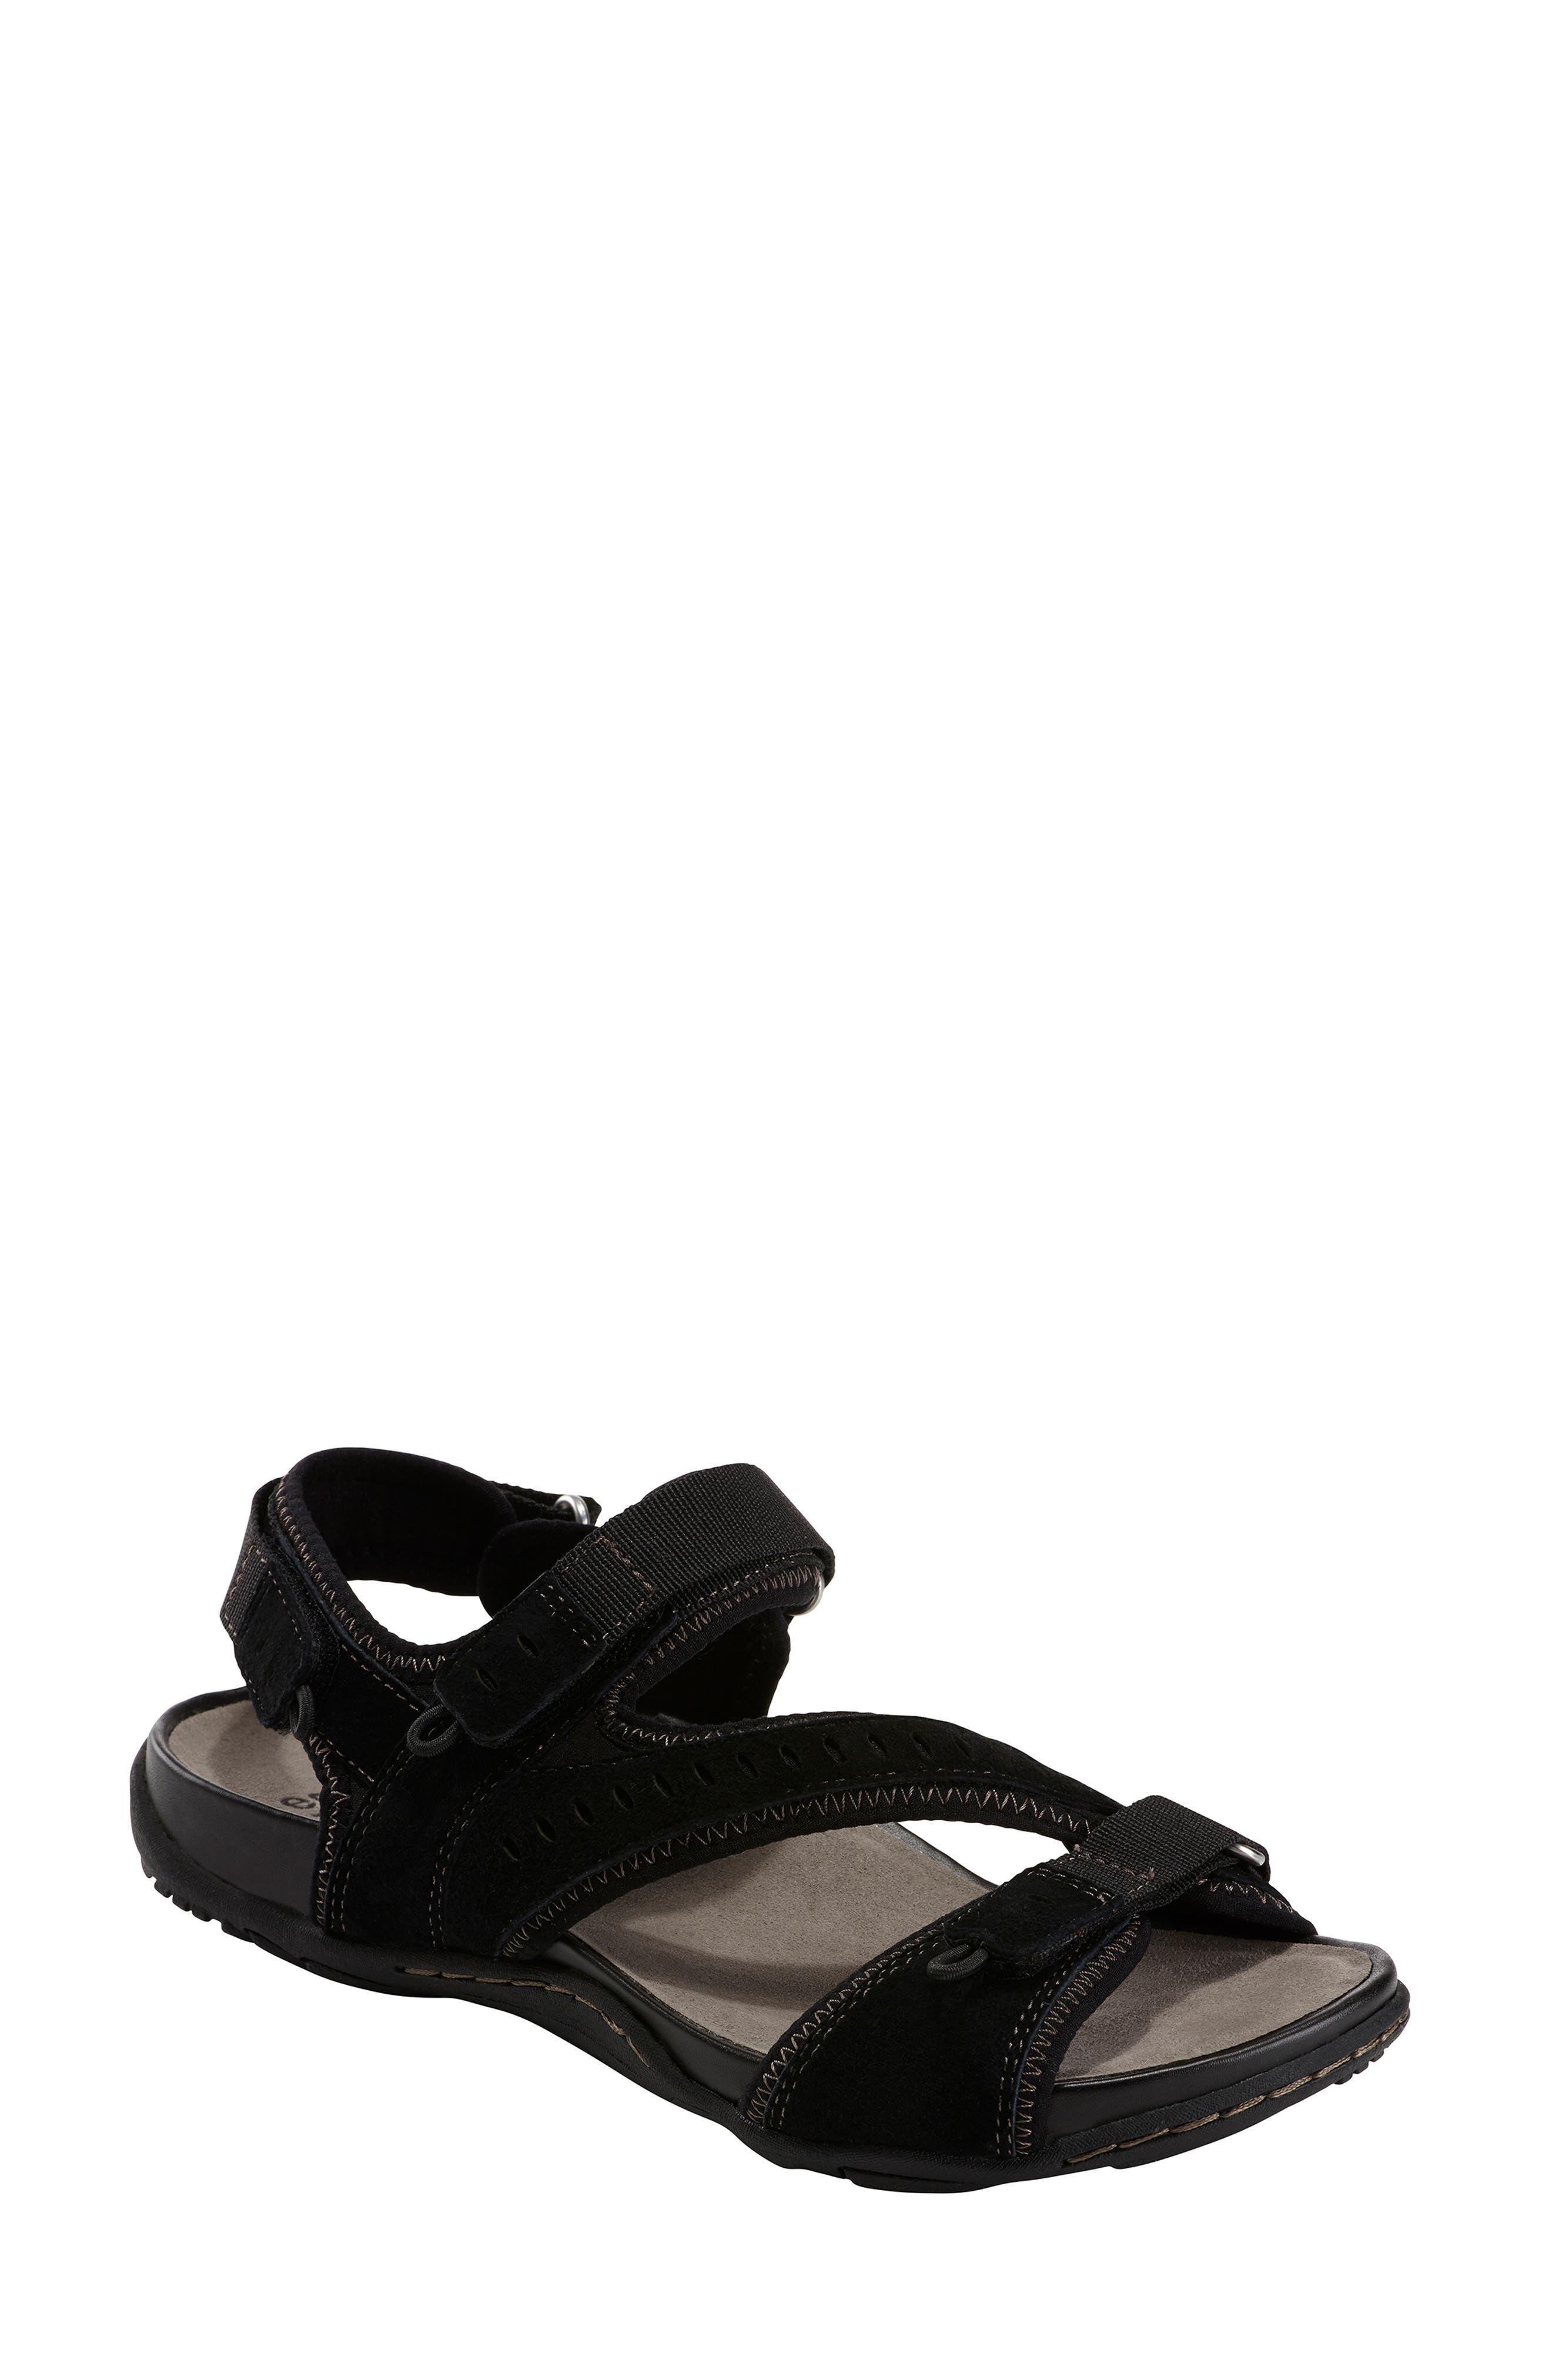 EARTH<SUP>®</SUP> Nevis Sandal, Main, color, BLACK NUBUCK LEATHER